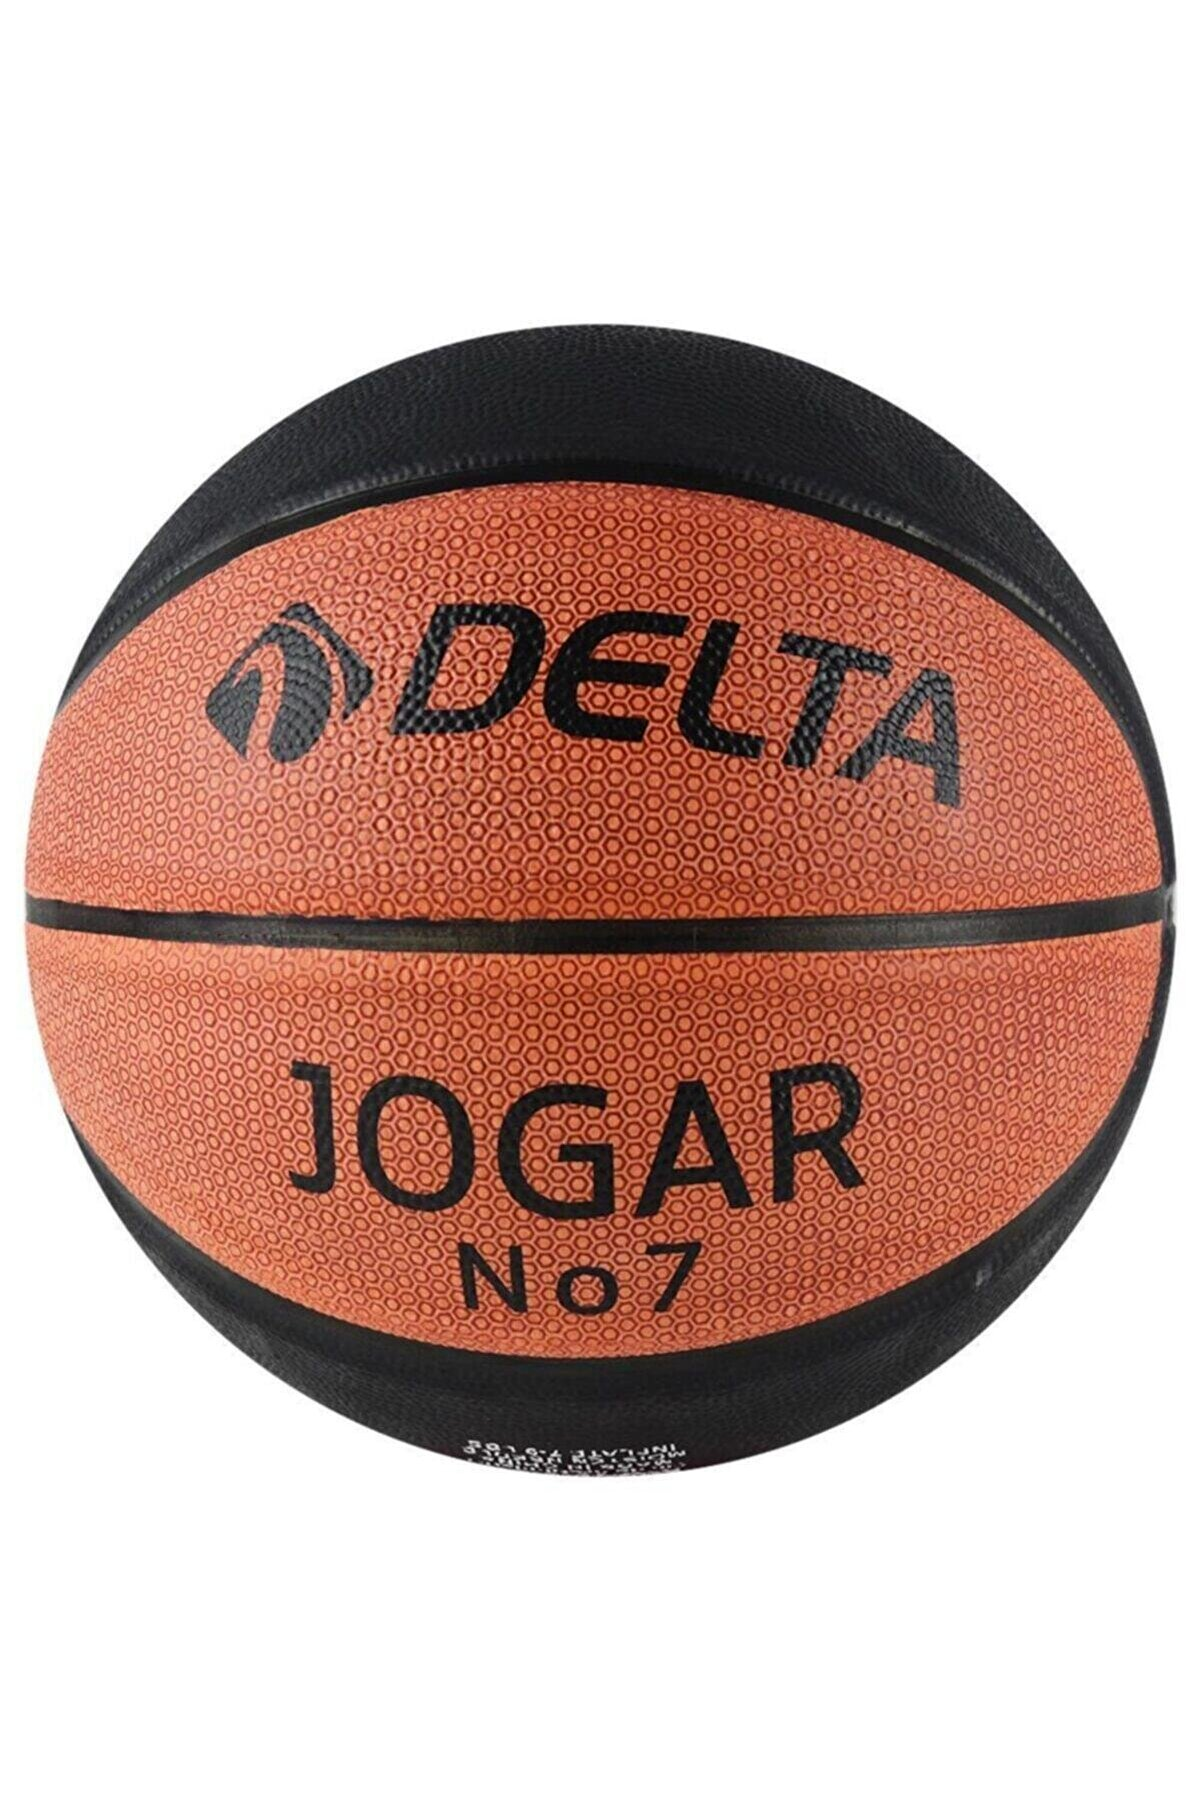 Delta Jogar Deluxe Dura-Strong 7 Numara Basketbol Topu